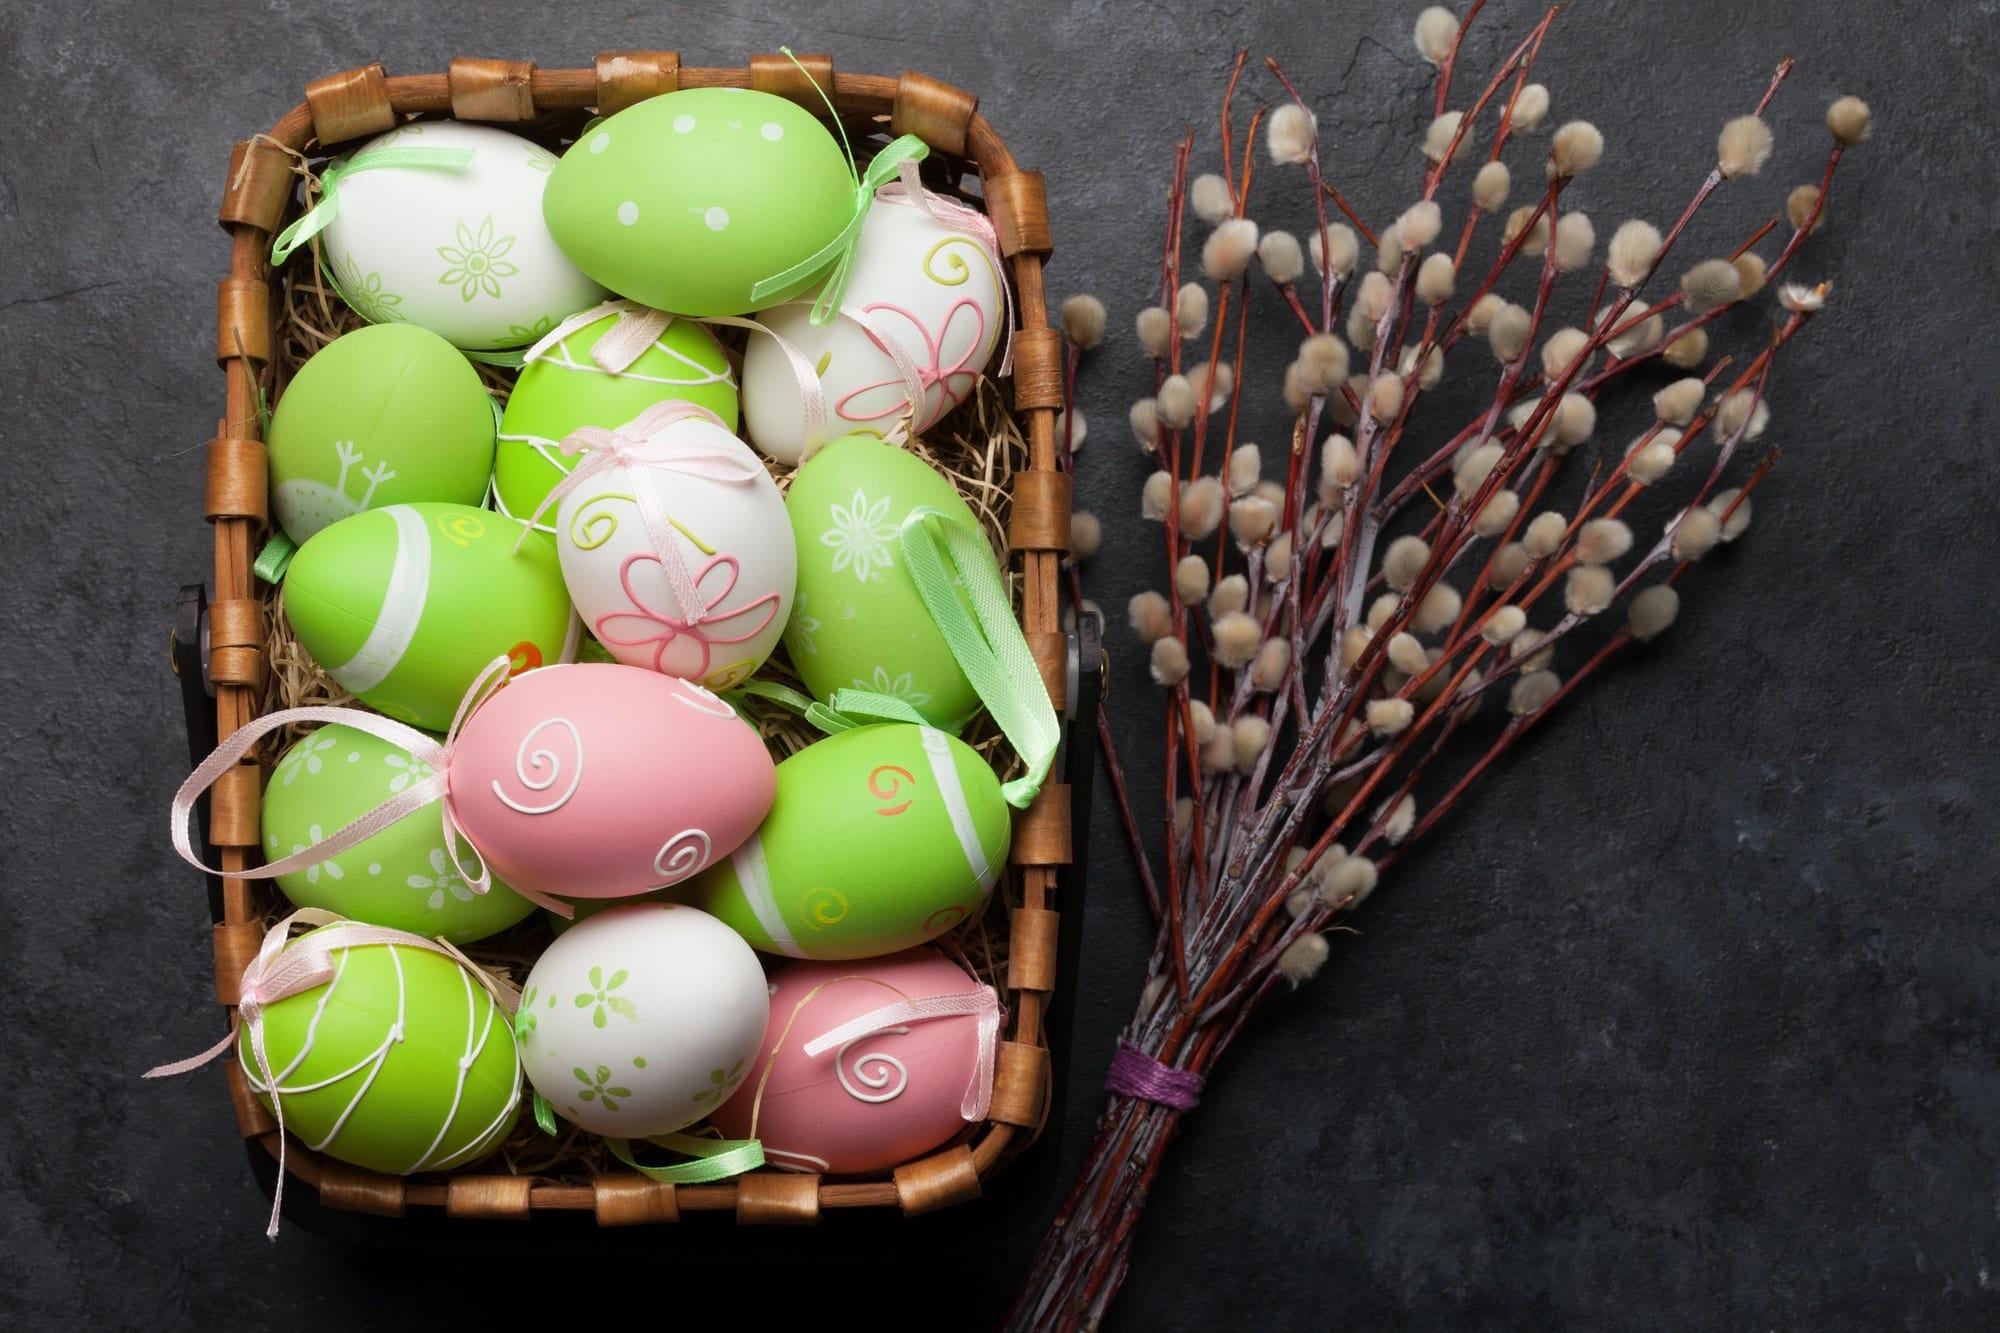 Tradiciones de Pascua - Tradiciones de Pascua en Francia